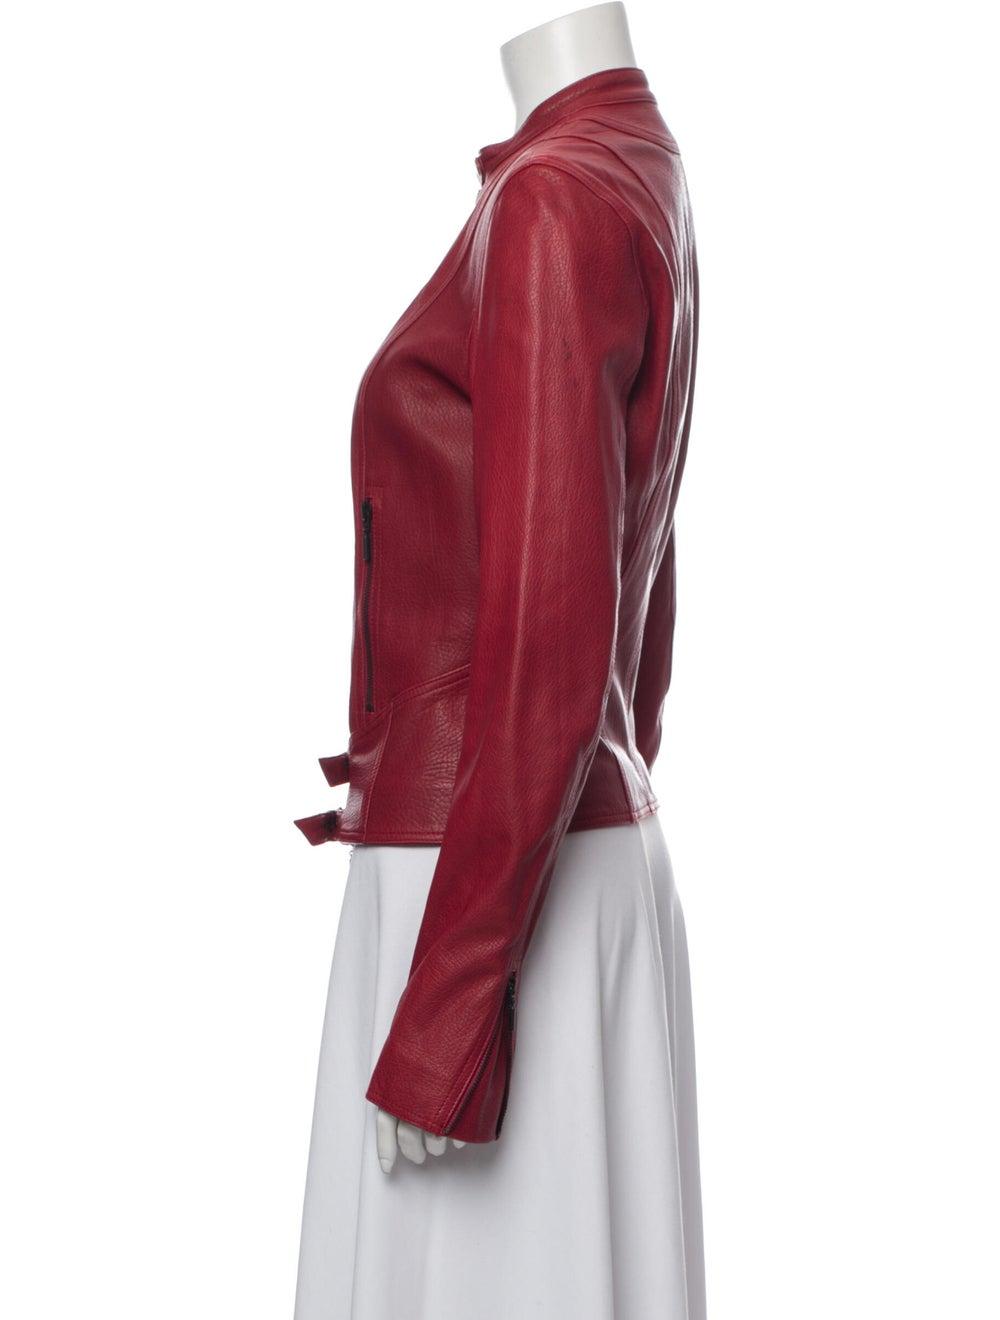 Plein Sud Lamb Leather Biker Jacket Red - image 2